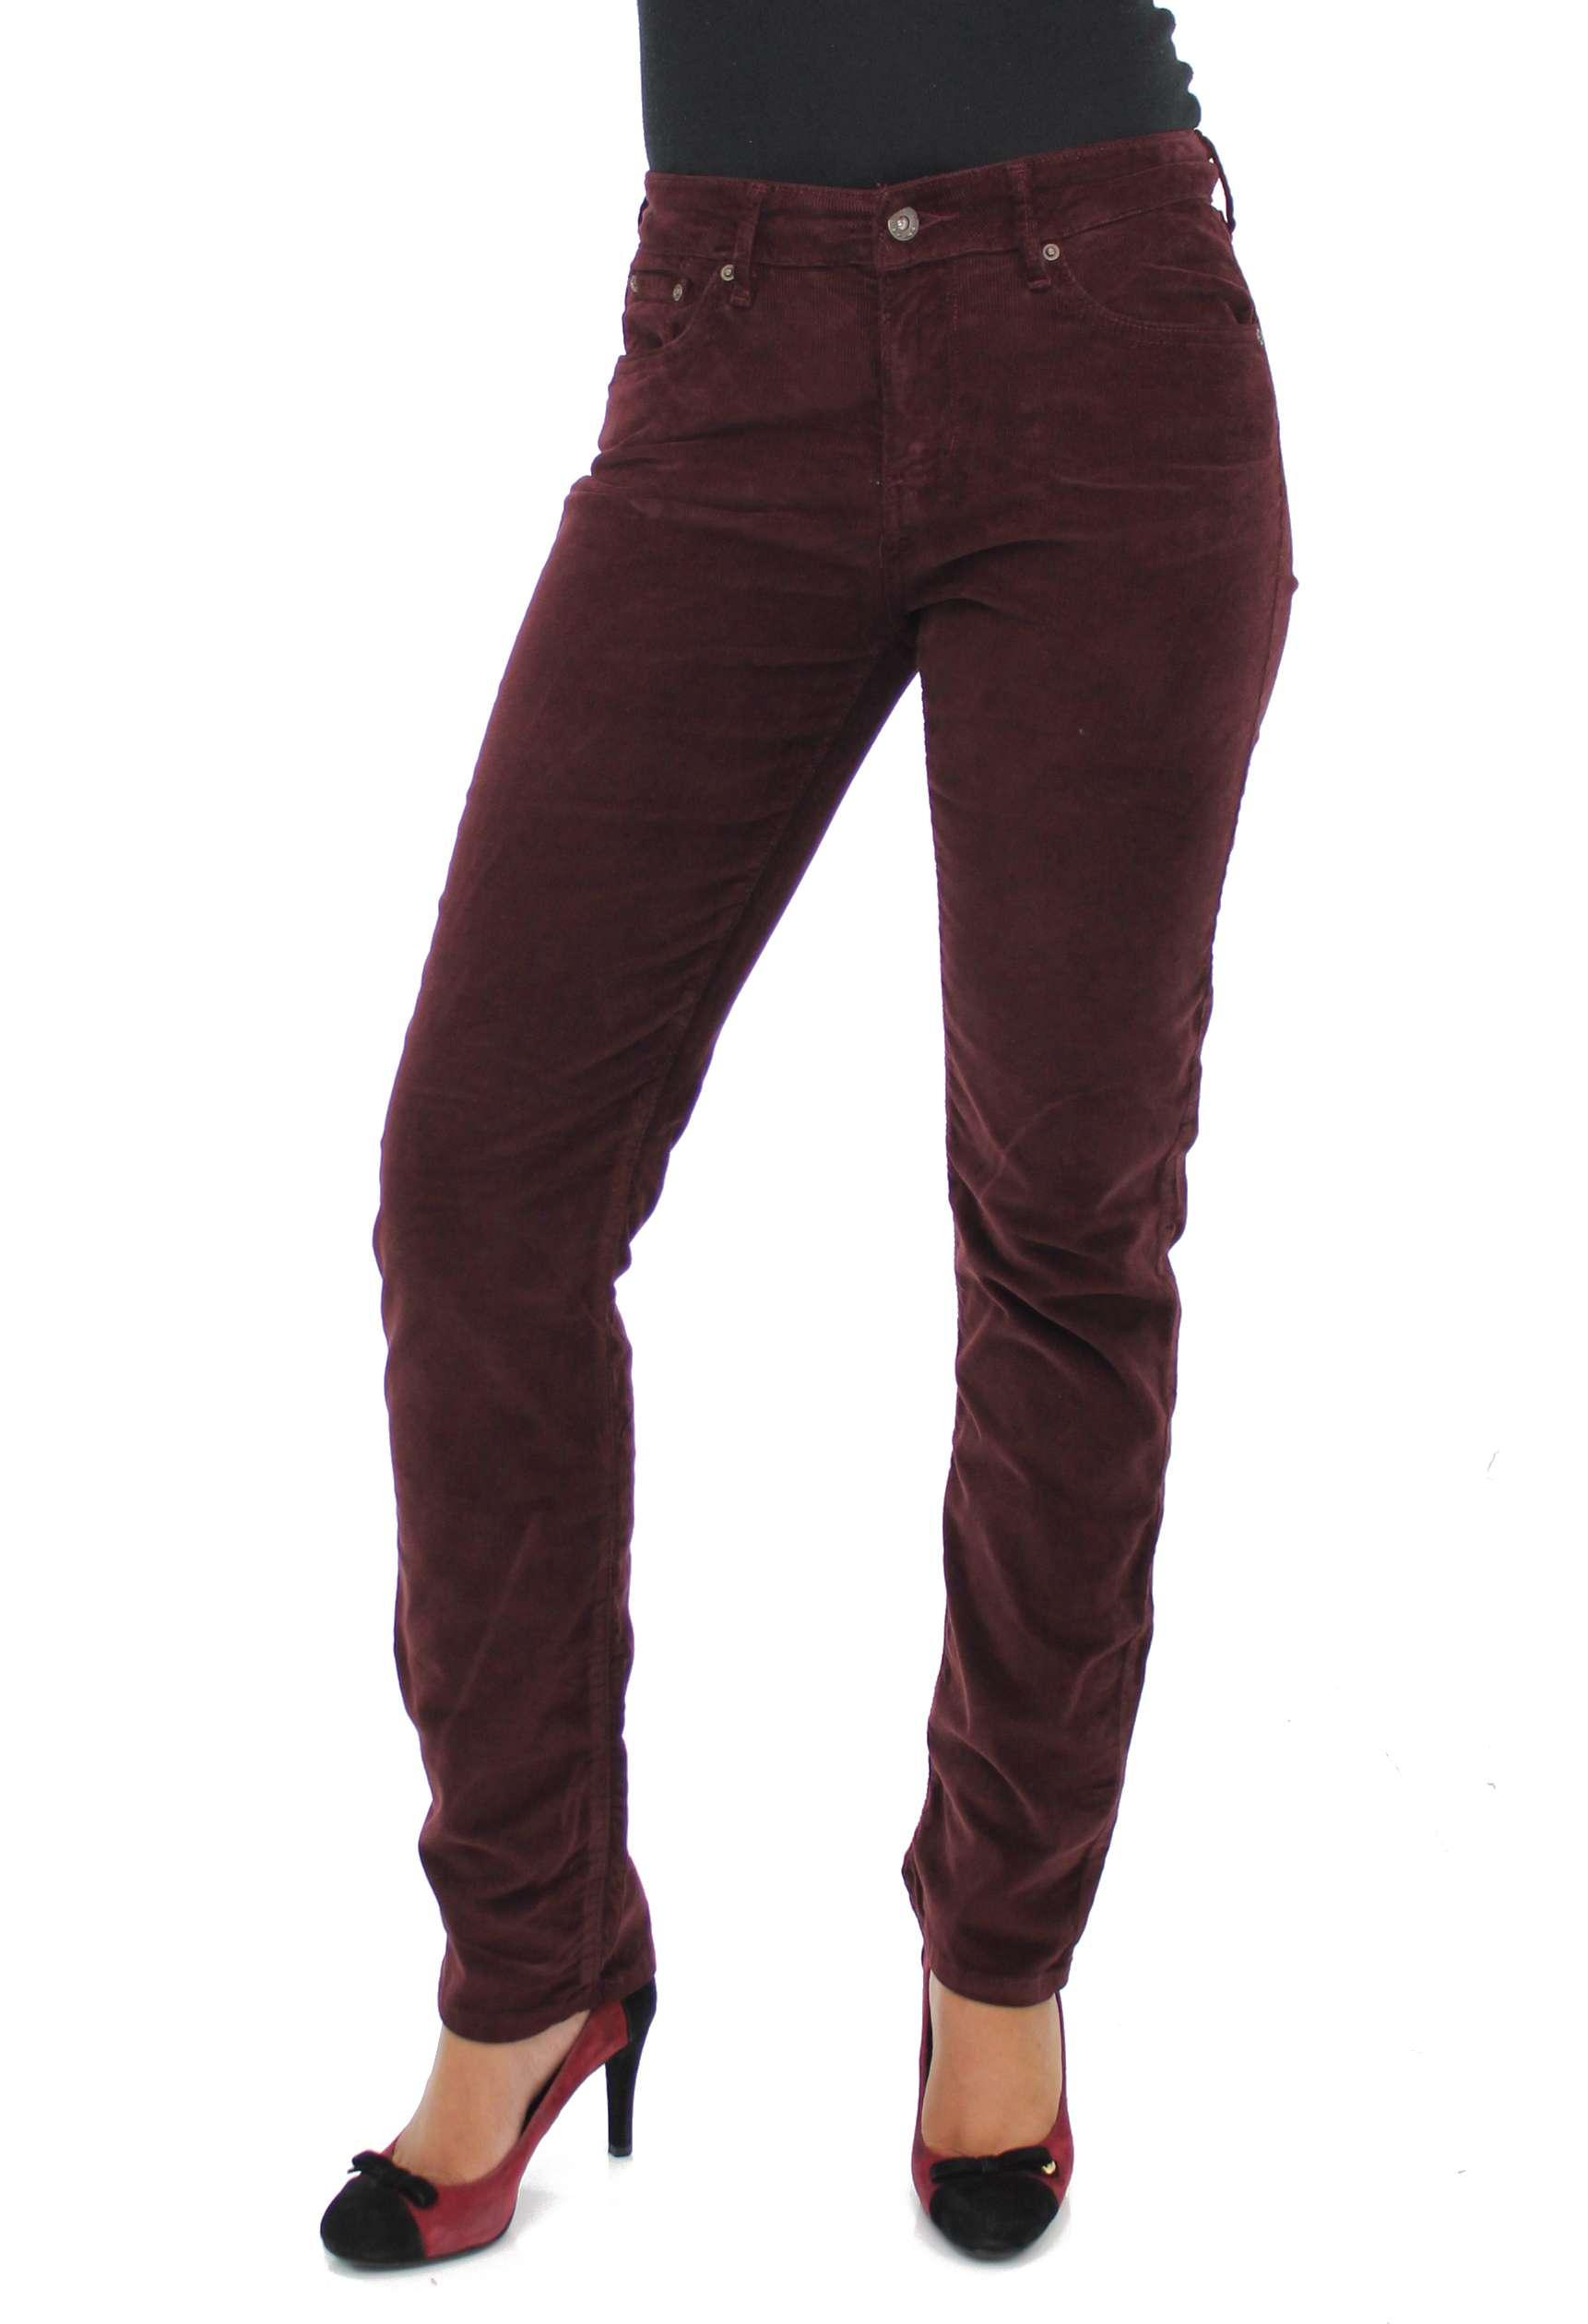 New Leviu2019s Tan Corduroy Demi Curve ID Slim Leg Pants For Women - Choose Your Size | EBay